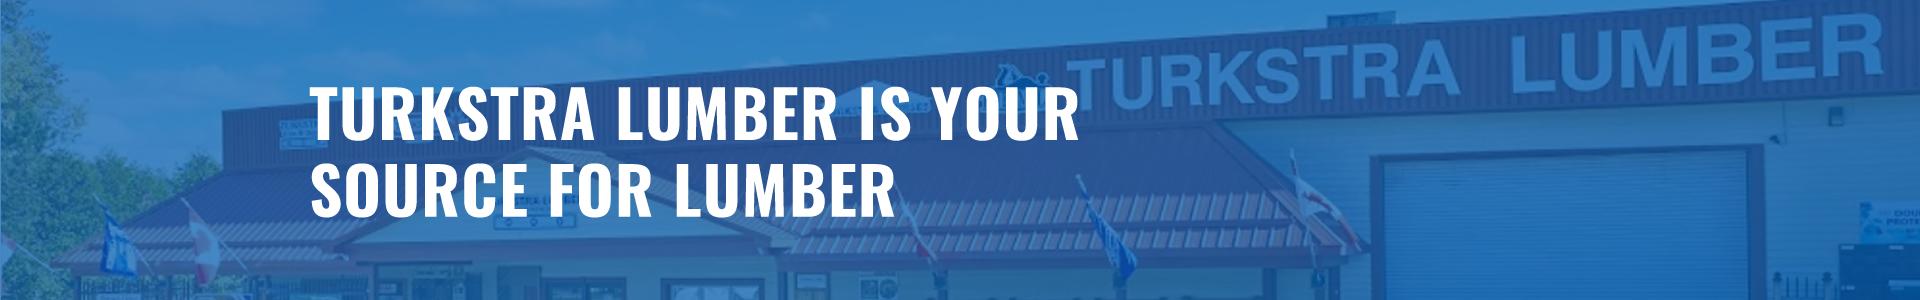 Turkstra Lumber Since 1953 - Smithville fences, decks, windows, trim, doors, hardware, install, trusses, engineered floor systems